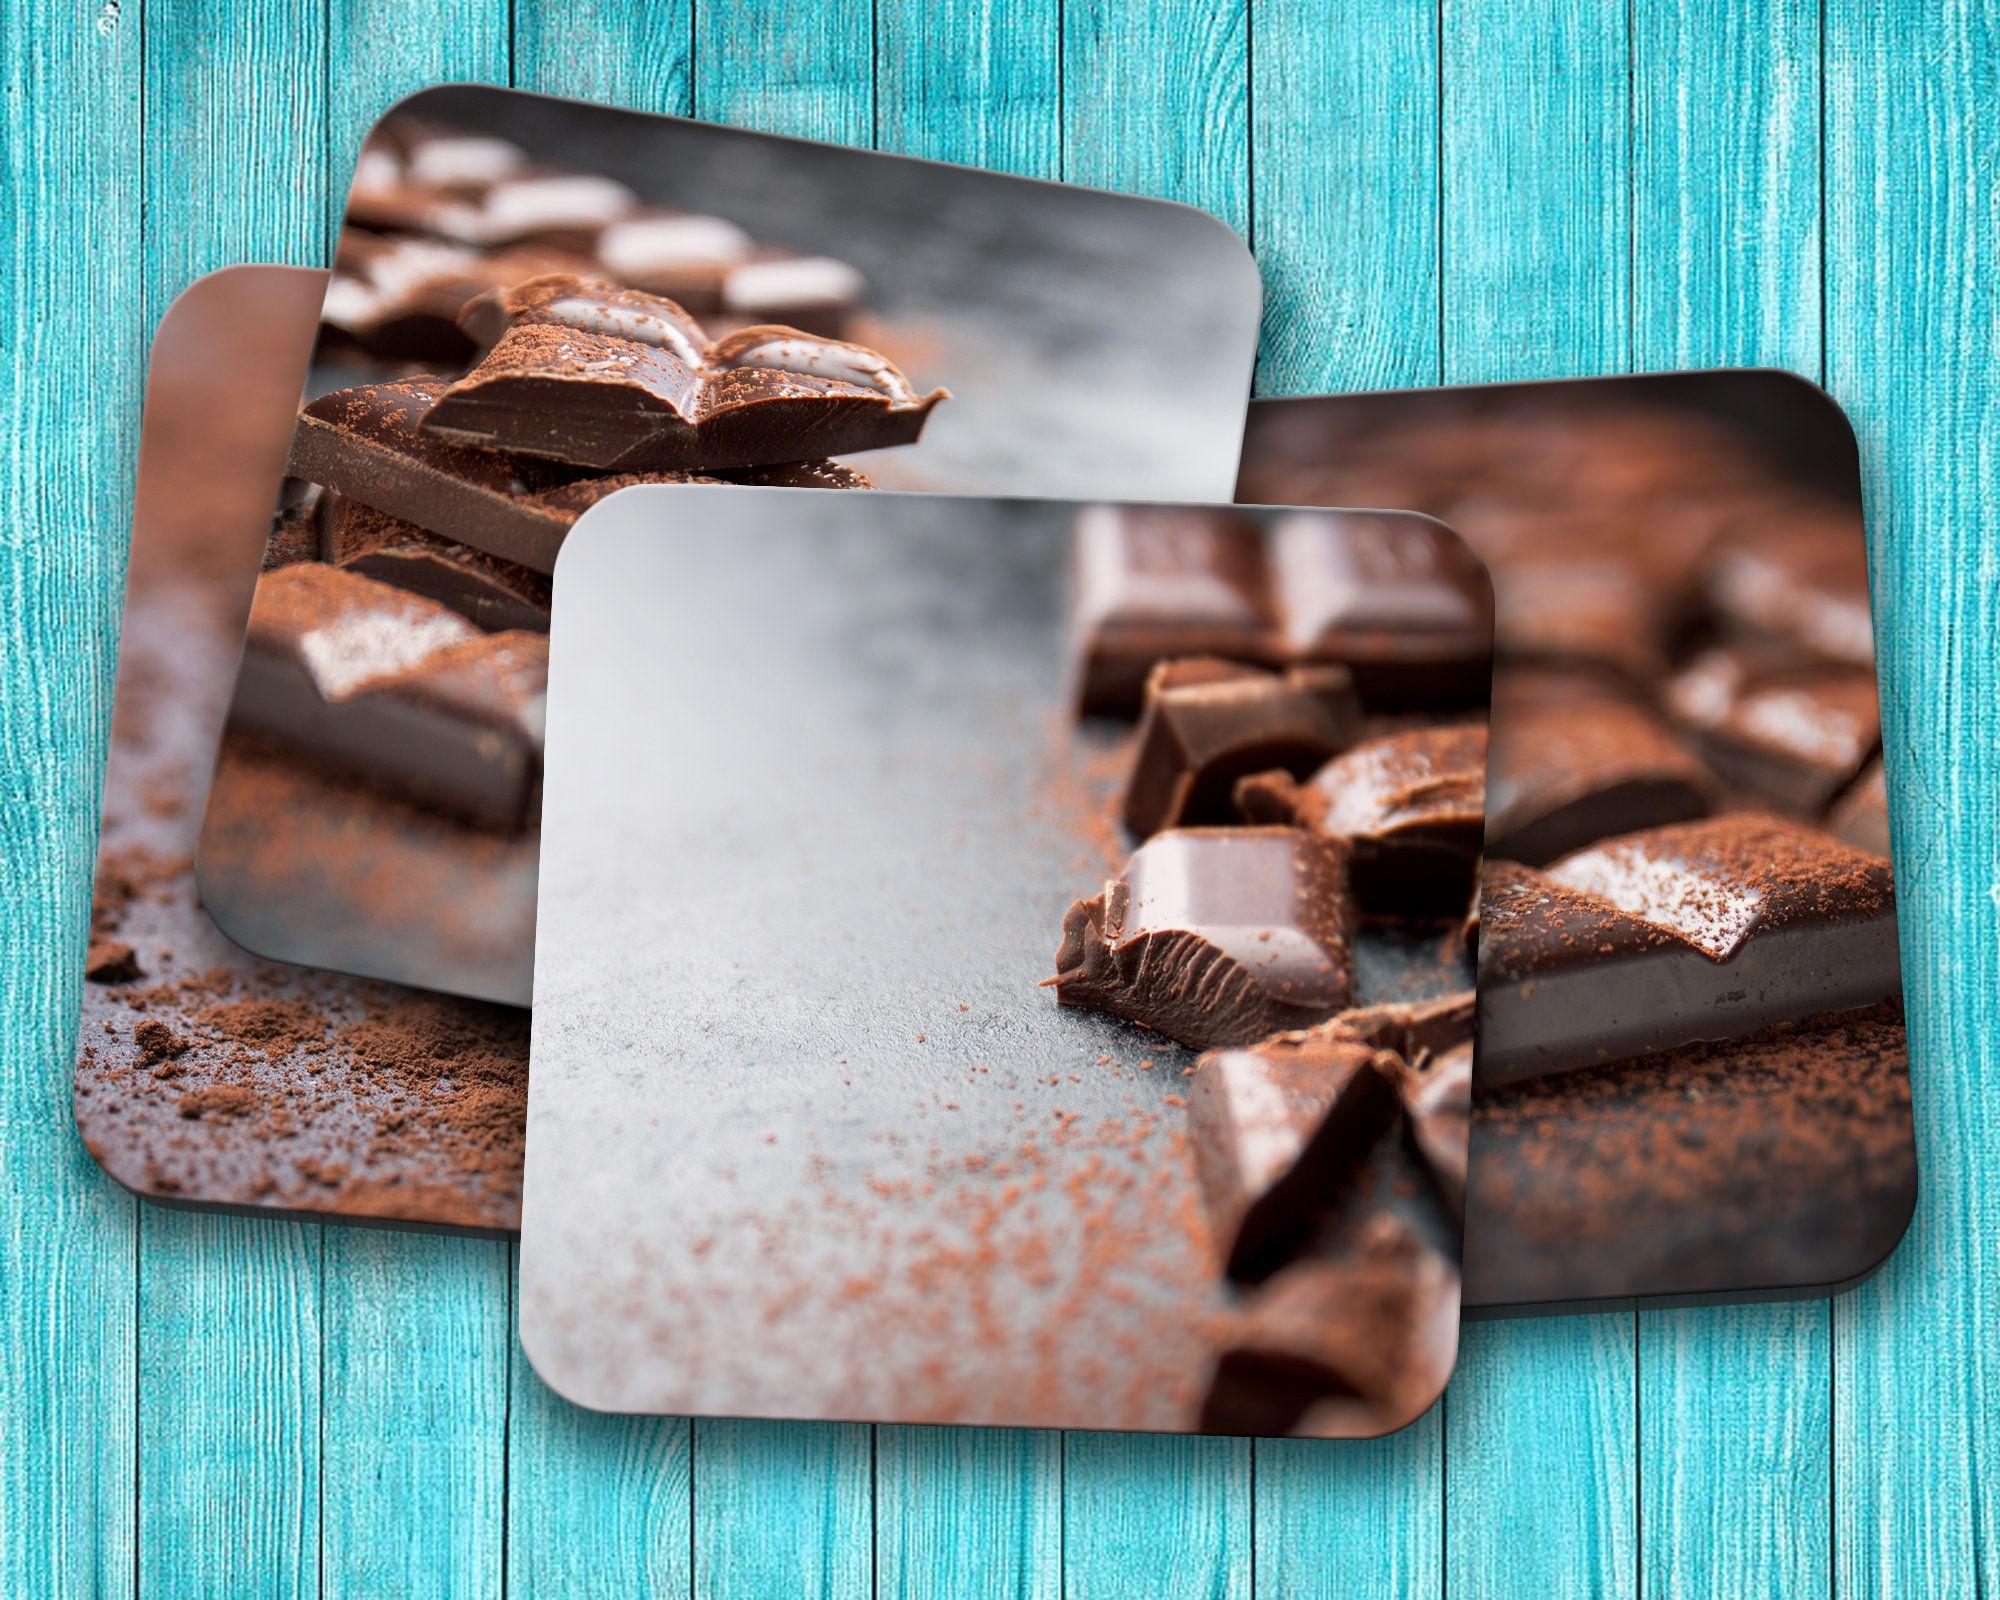 Chocolate Coaster Set, Chocolate Bar Furniture Drink Coaster Set, Housewarming